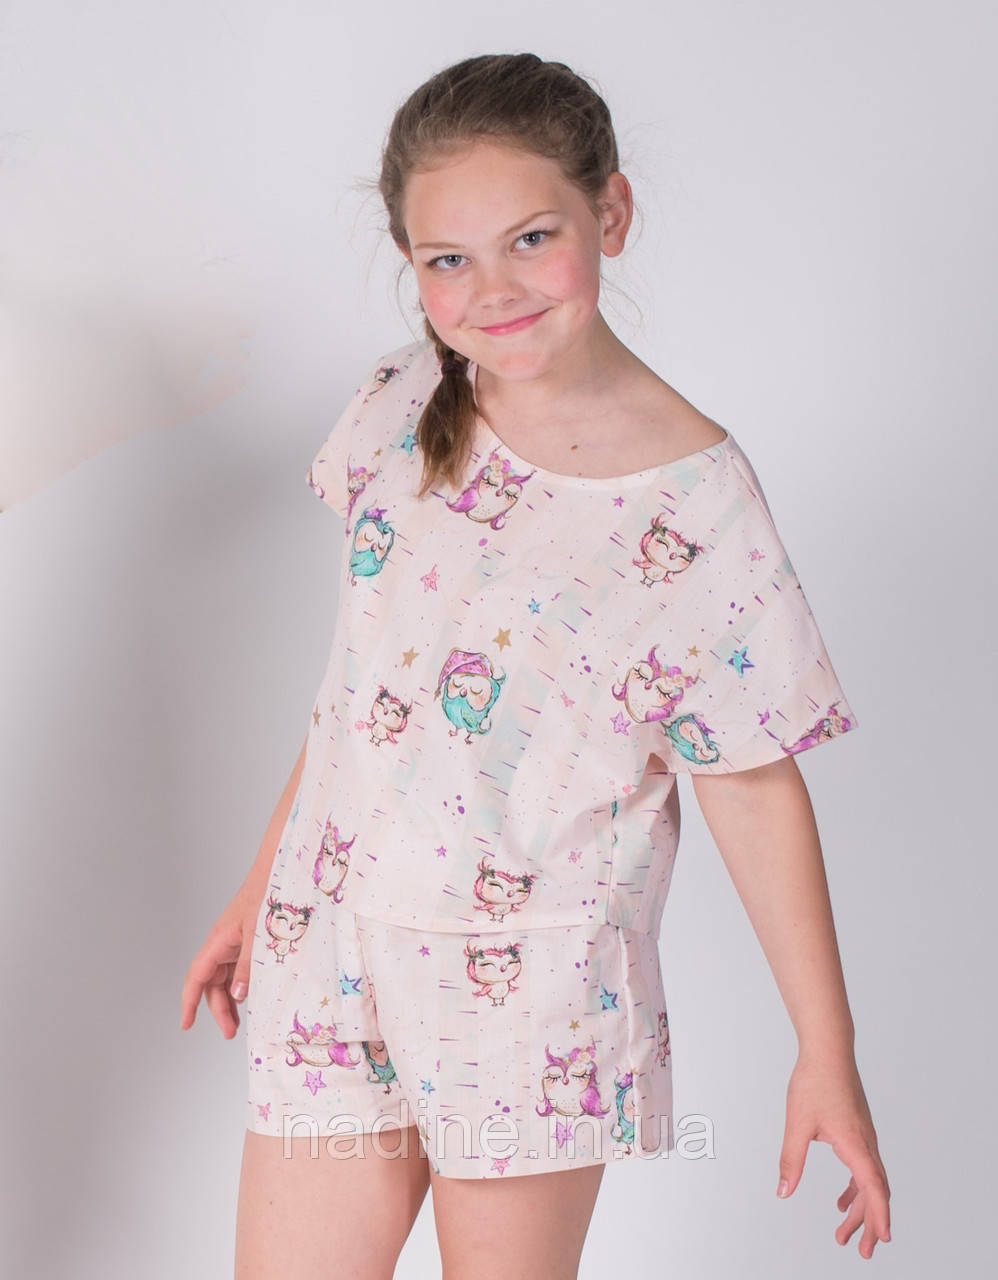 Пижама на подростка  Nadine (783-52) 152/38,  персиковый